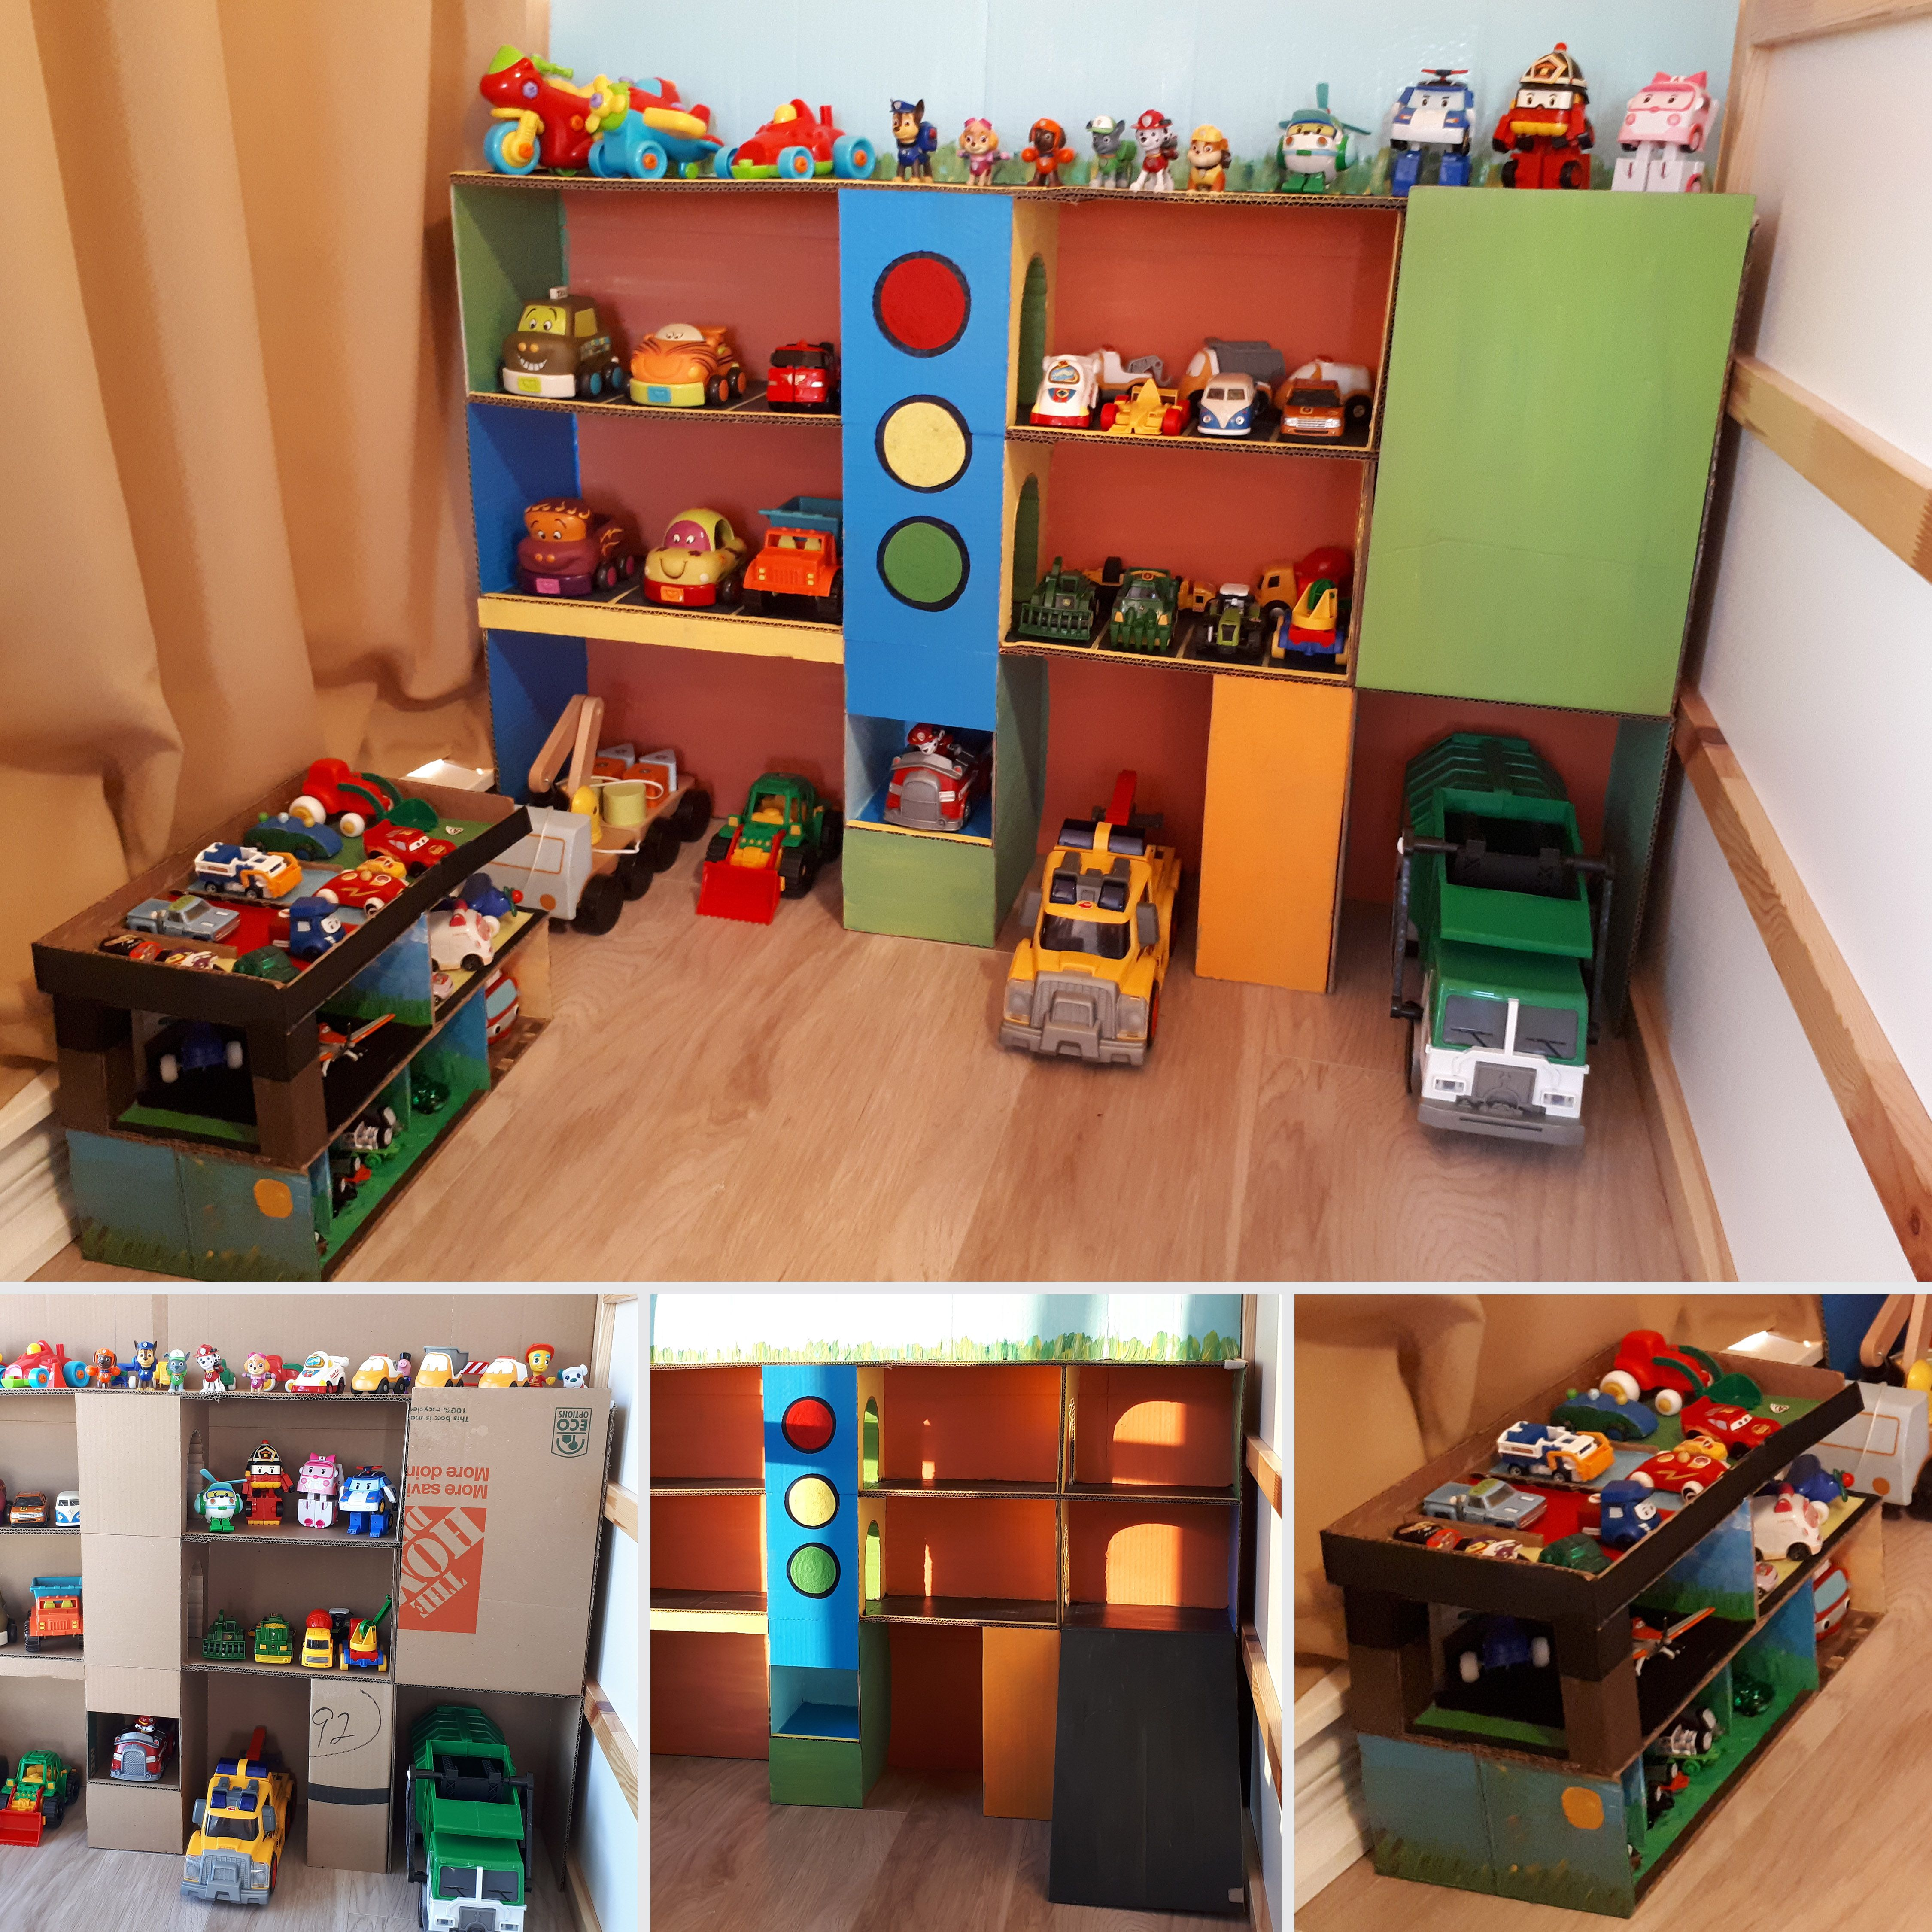 Cardboard Toy Car Garage Diy Ideas Reuse And Play Toy Garage Diy Toy Storage Toy Storage Kids Room